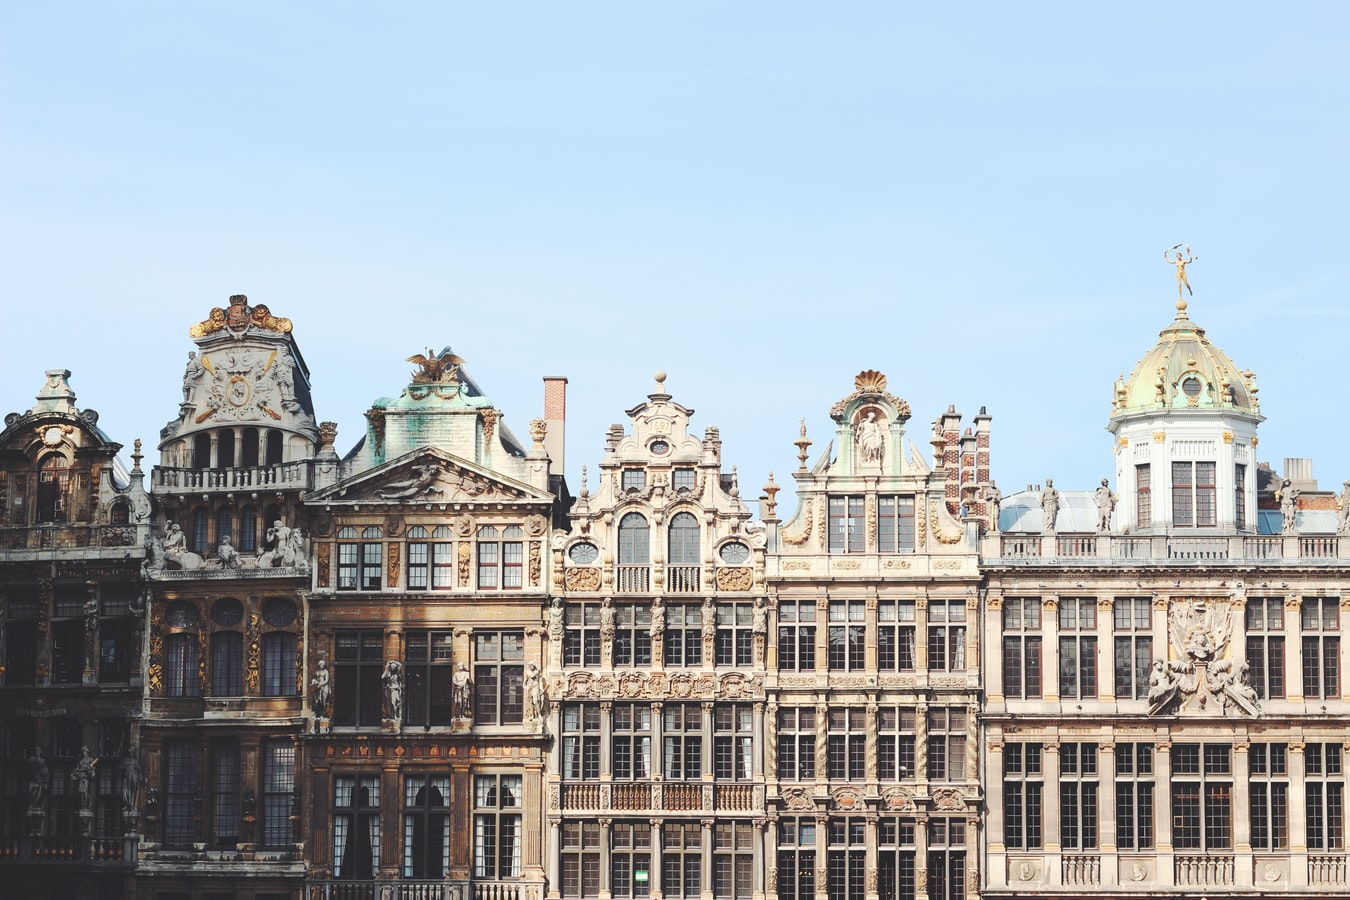 Royal palace in Belgium